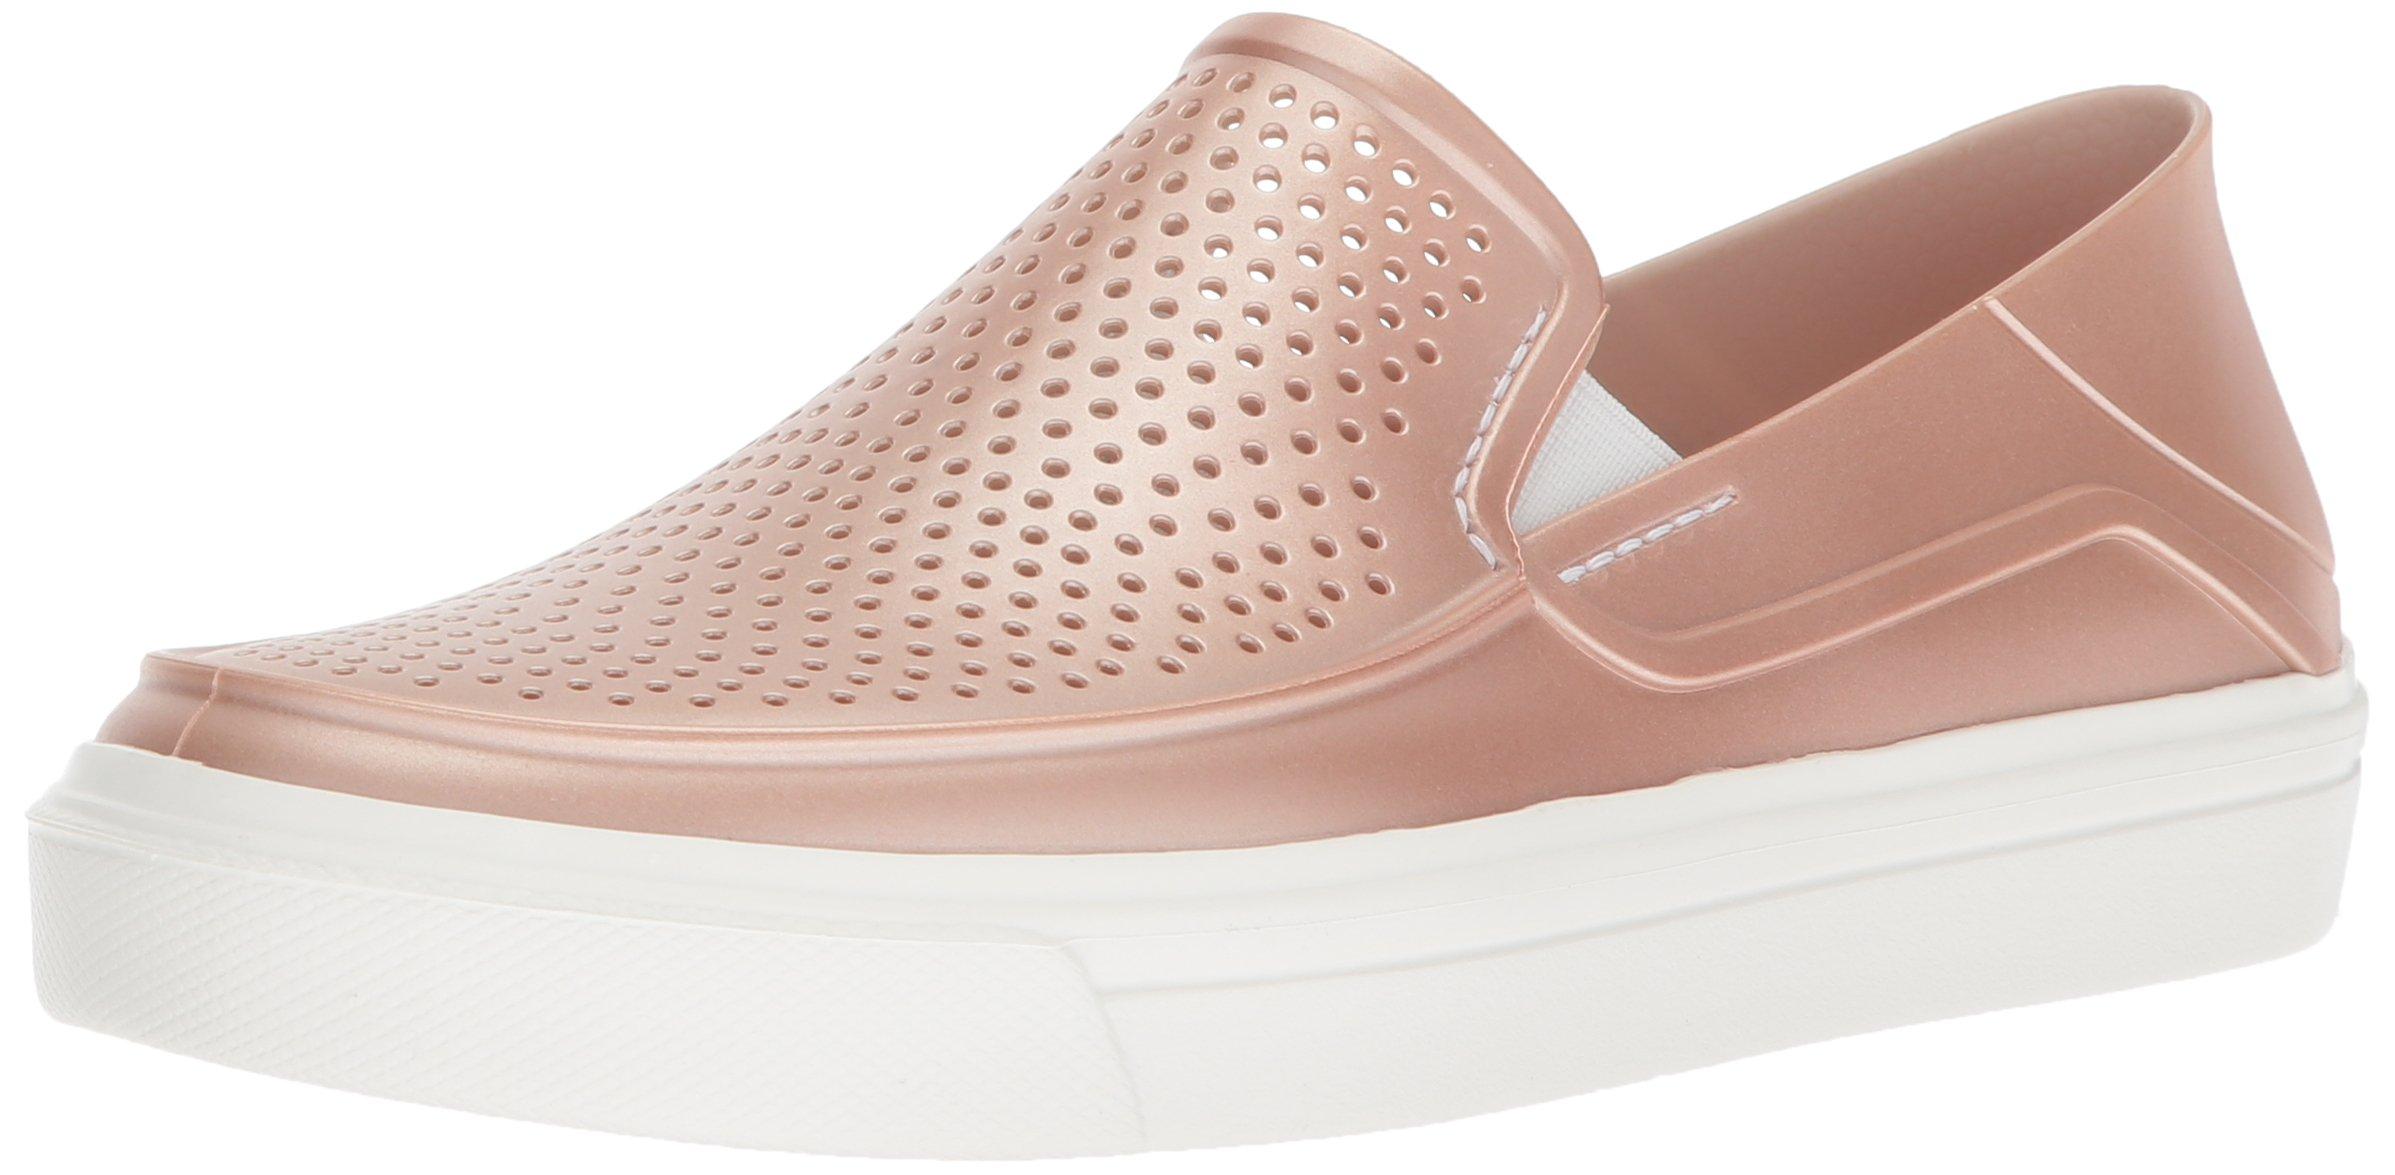 Crocs Women's Citilane Roka Metallic SLP W Sneaker, Rose Dust, 6 M US